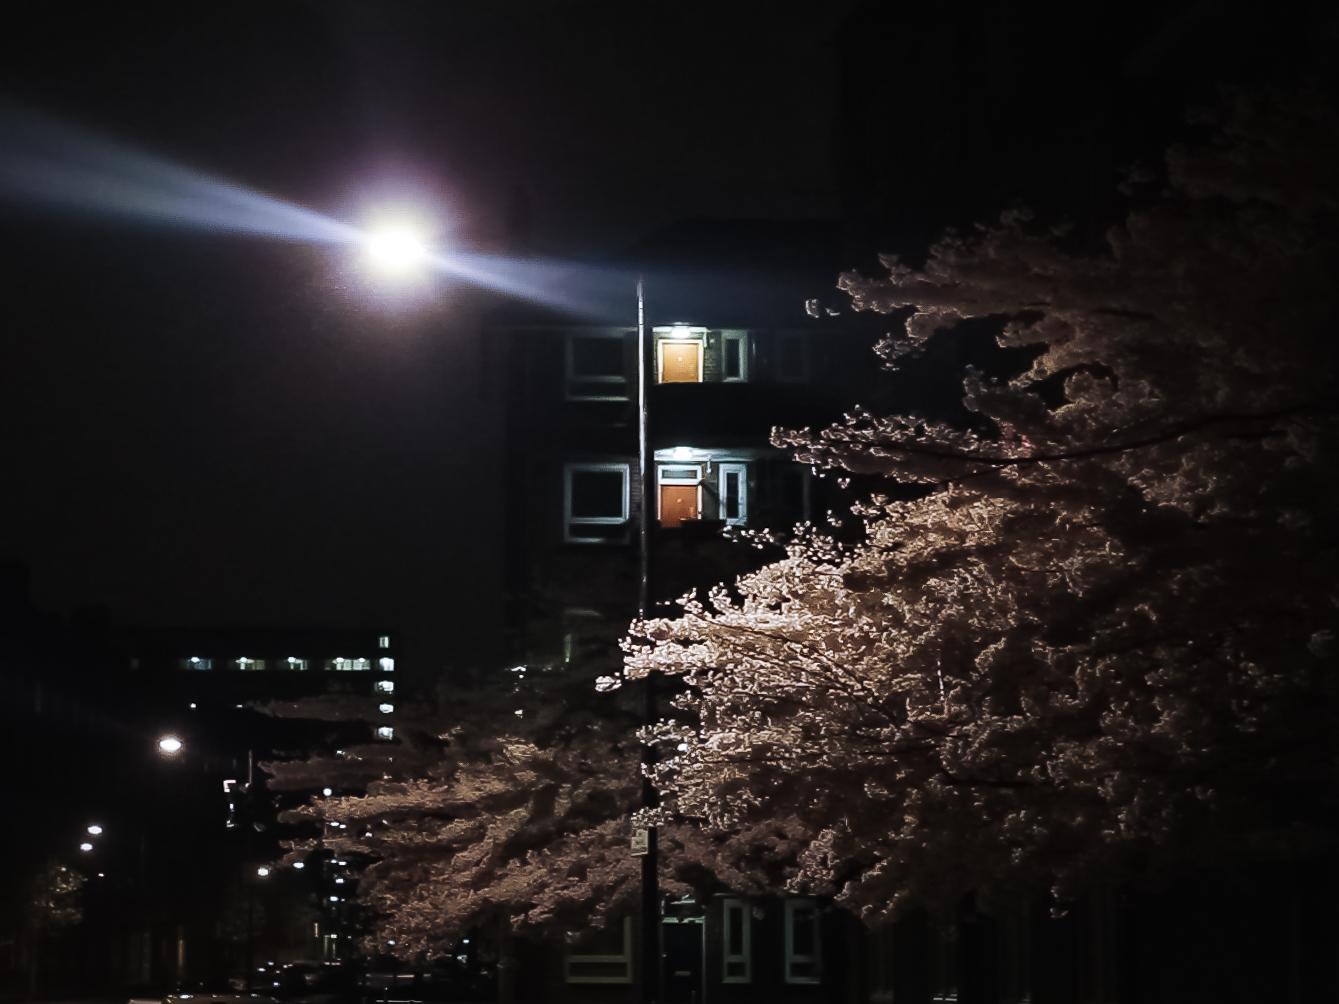 flowers at night.jpg